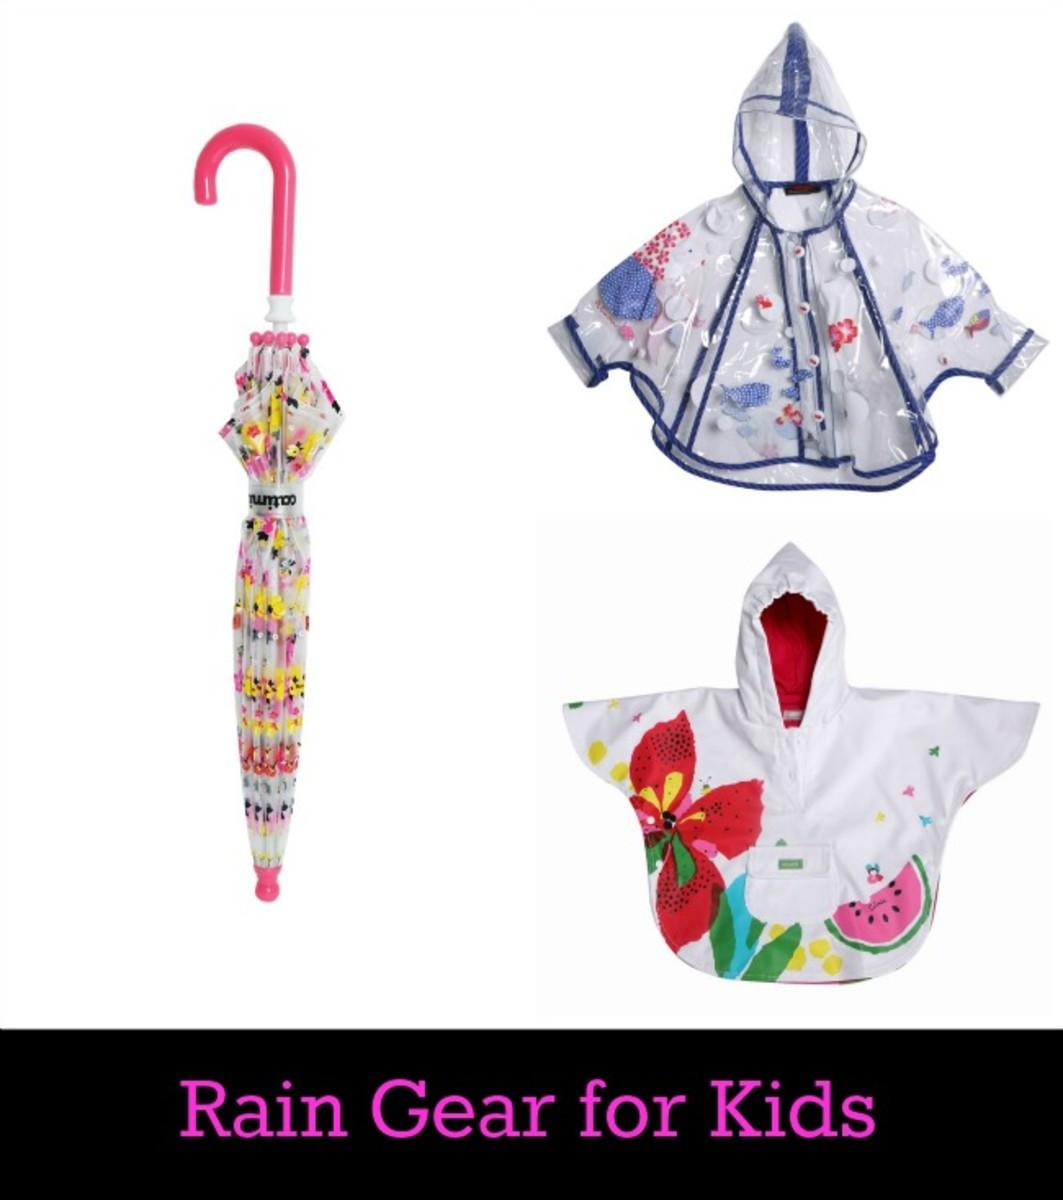 floral prints, summer 2013 fashion trends, spring 2013 fashion trends, kids floral prints, floral rain gear, kids rain gear, catimini